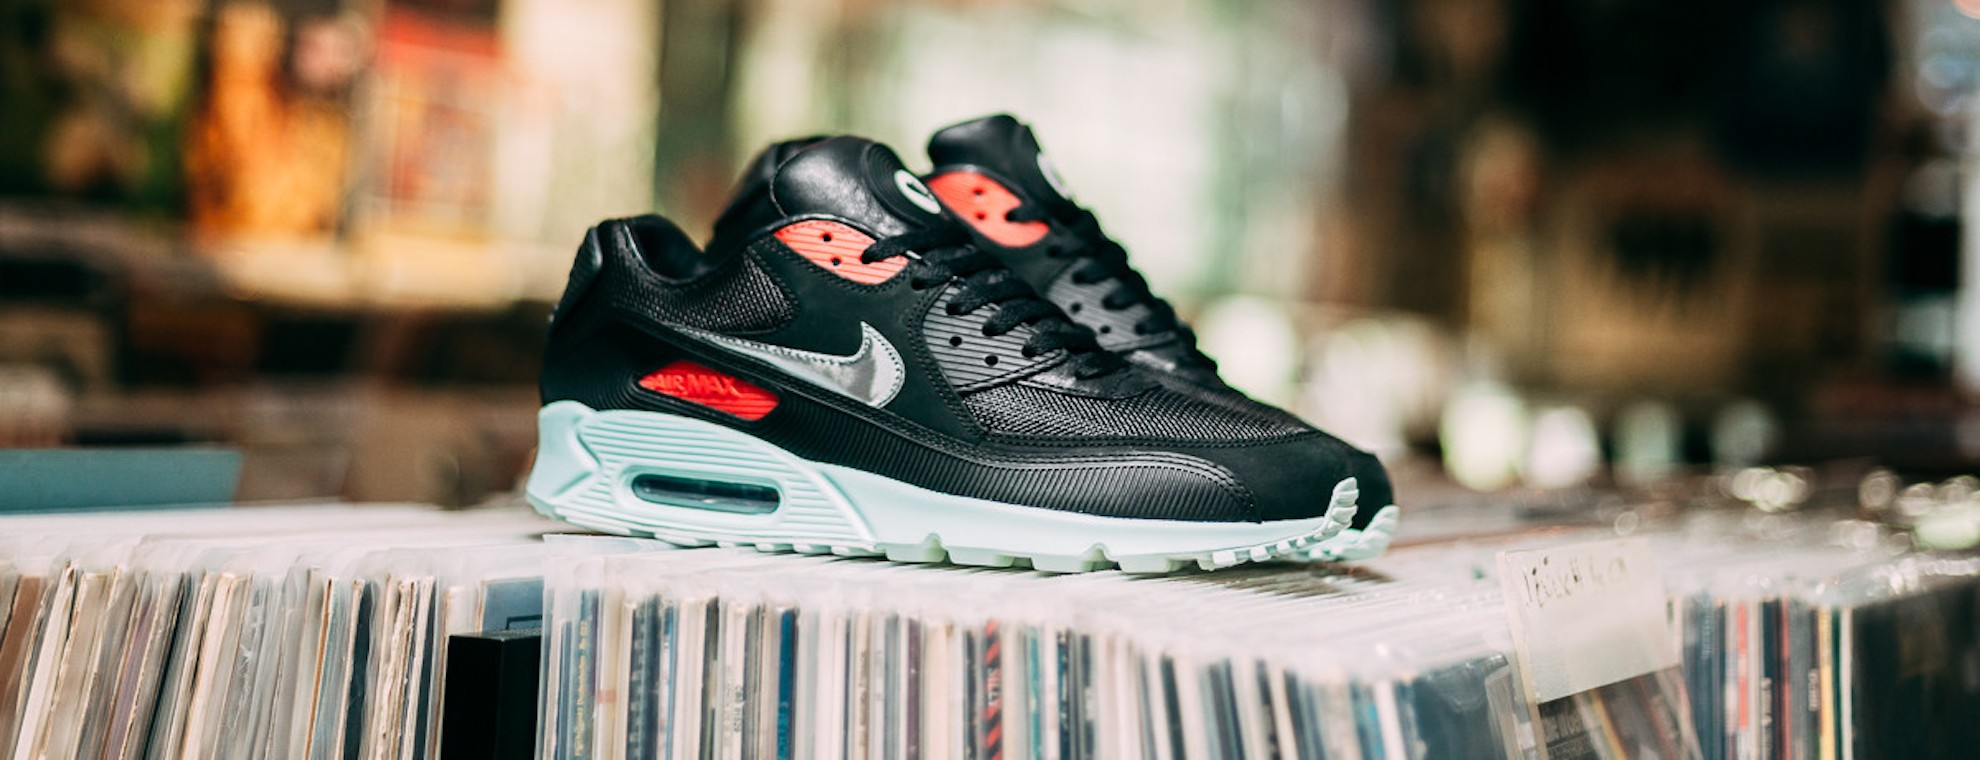 Nike Air Max 97 SNEAKER2WEAR